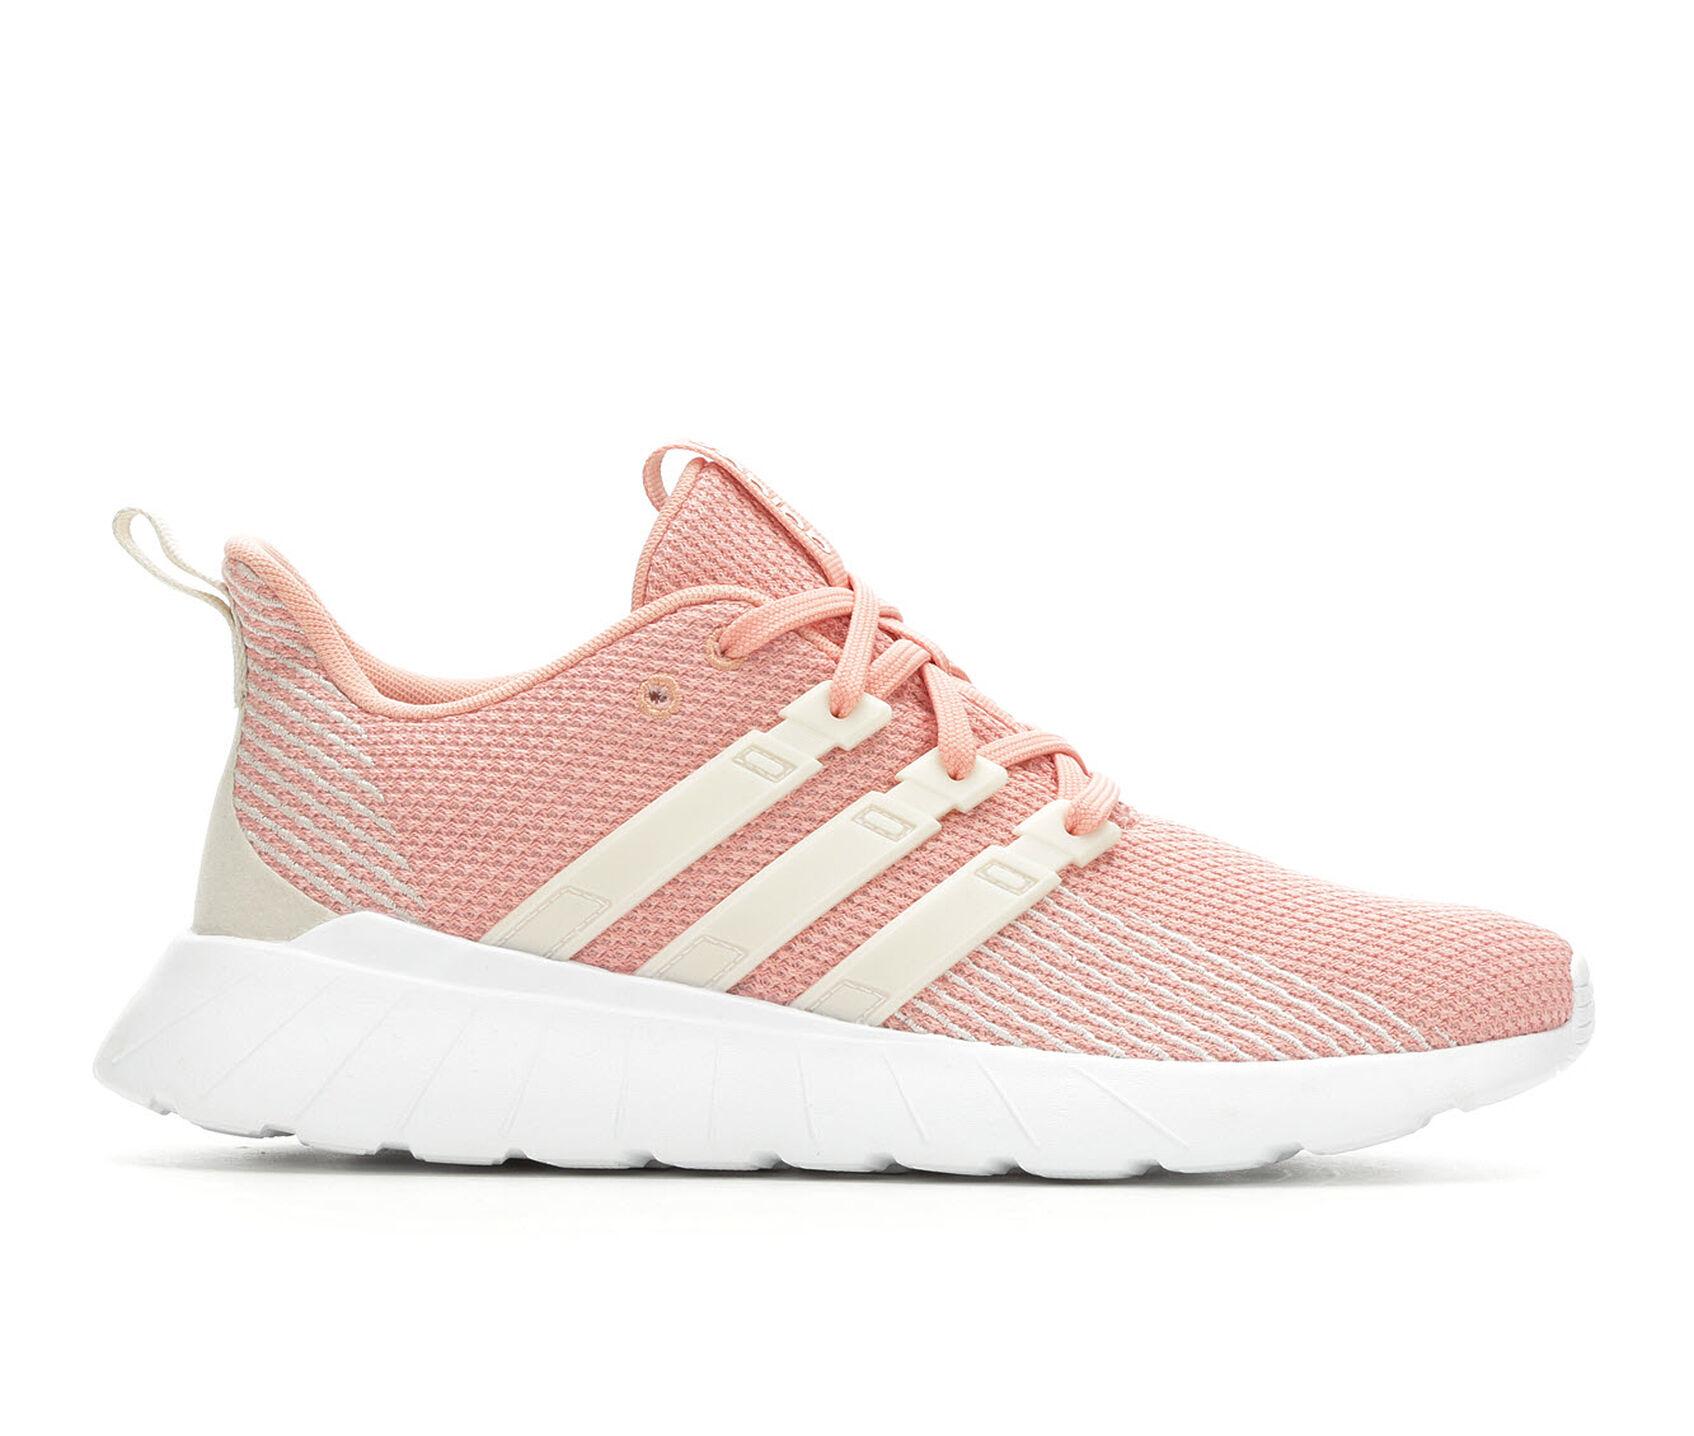 wholesale dealer 2855f cda31 Womens Adidas Questar Flow Sneakers  Shoe Carnival